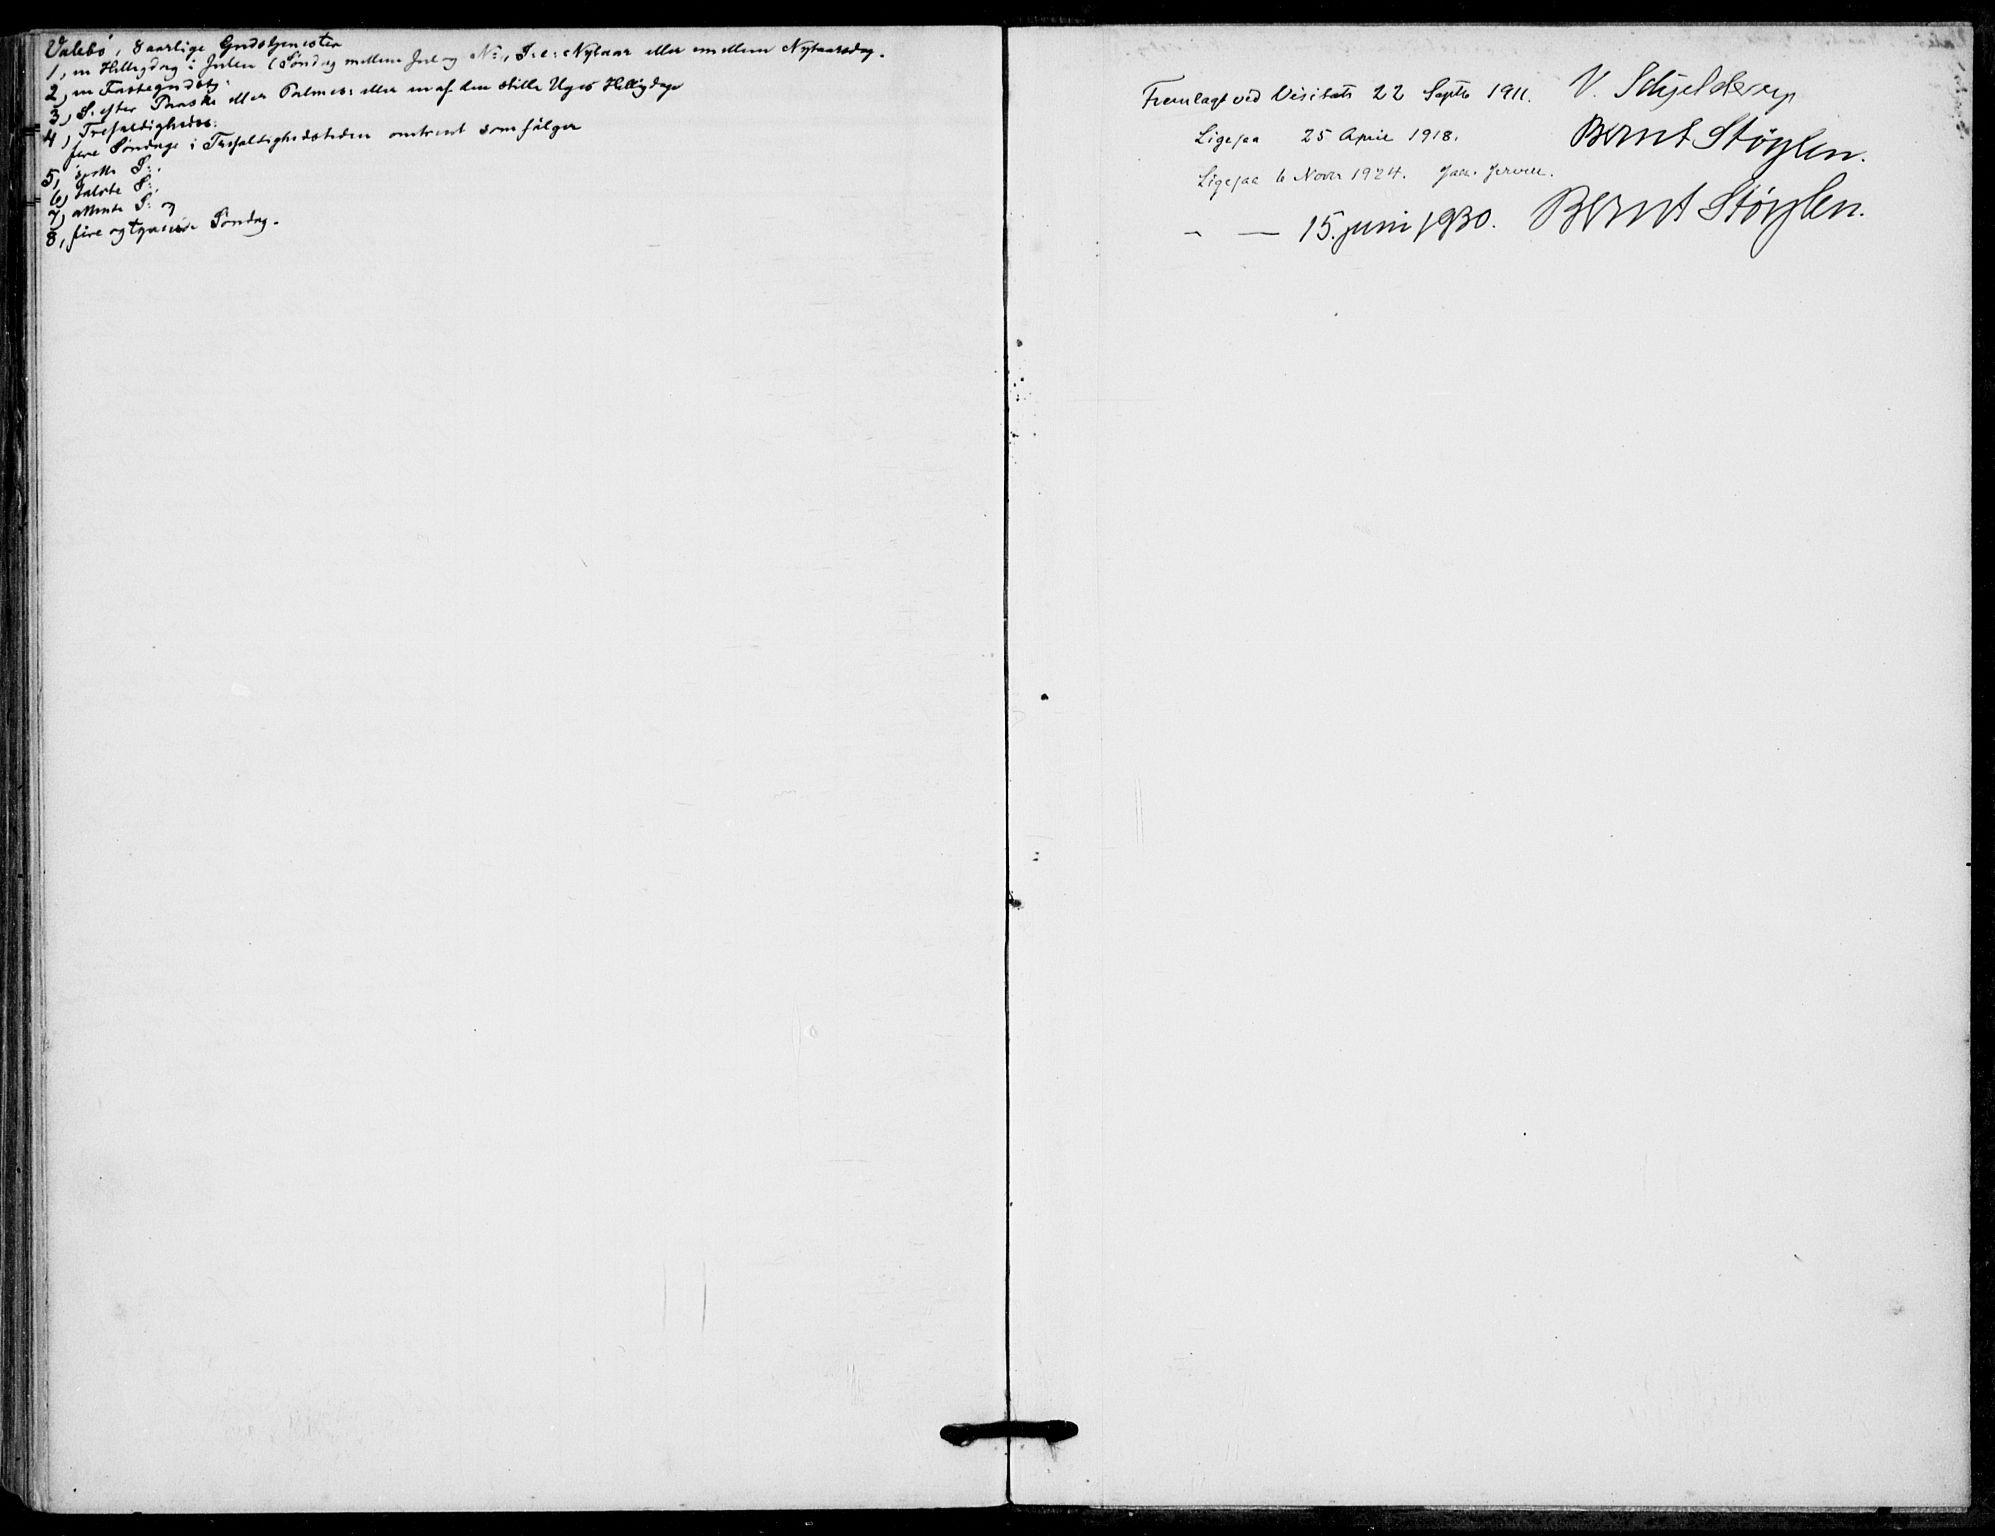 SAKO, Holla kirkebøker, F/Fa/L0012: Ministerialbok nr. 12, 1907-1923